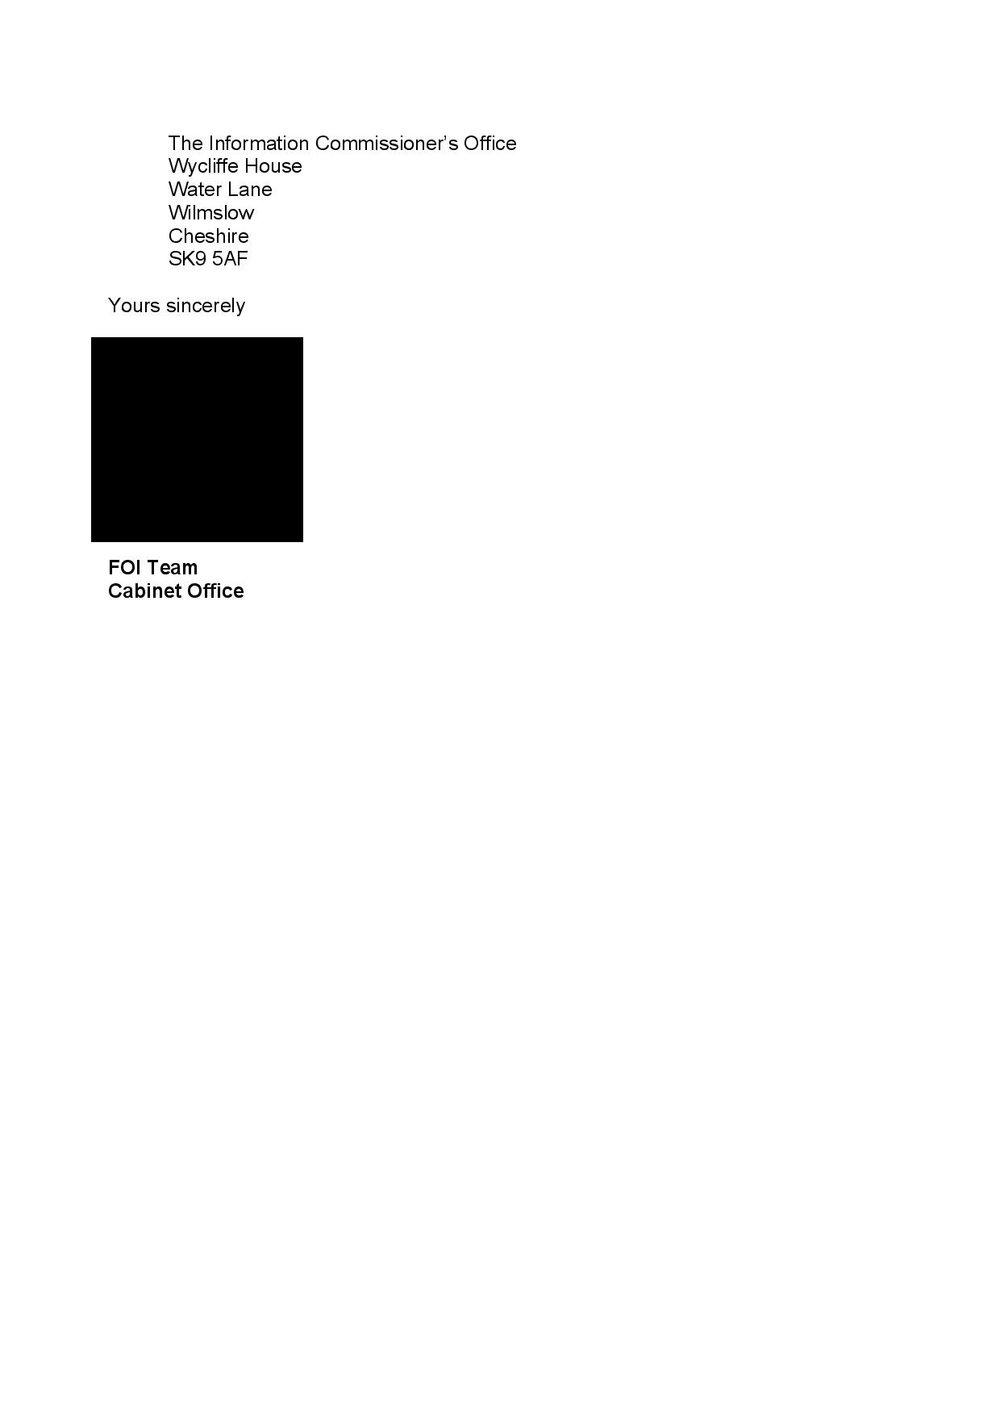 FOI323721 Reply (1)-page-002.jpg